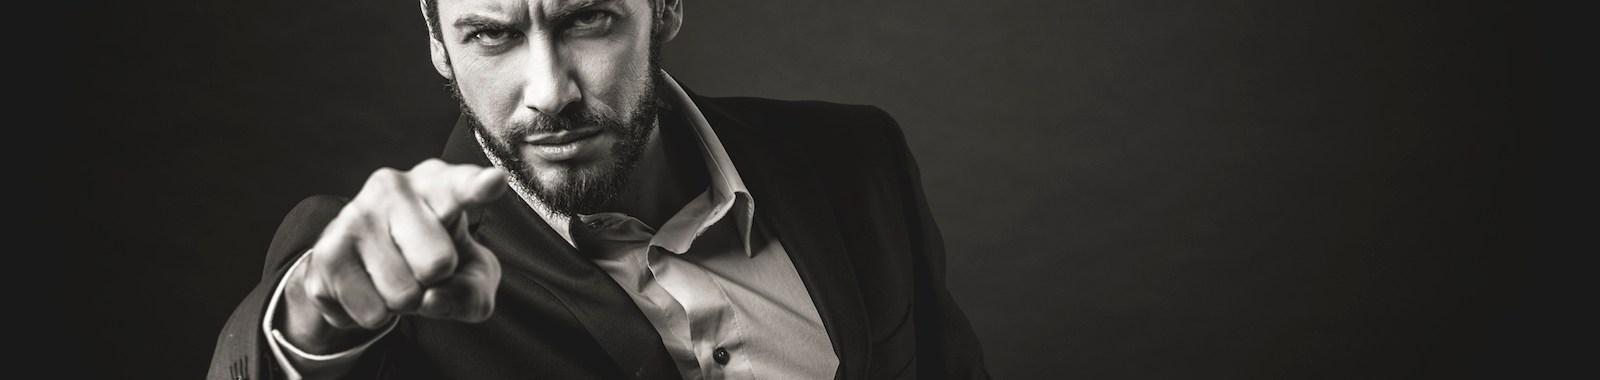 Aggressive businessman pointing finger against dark background